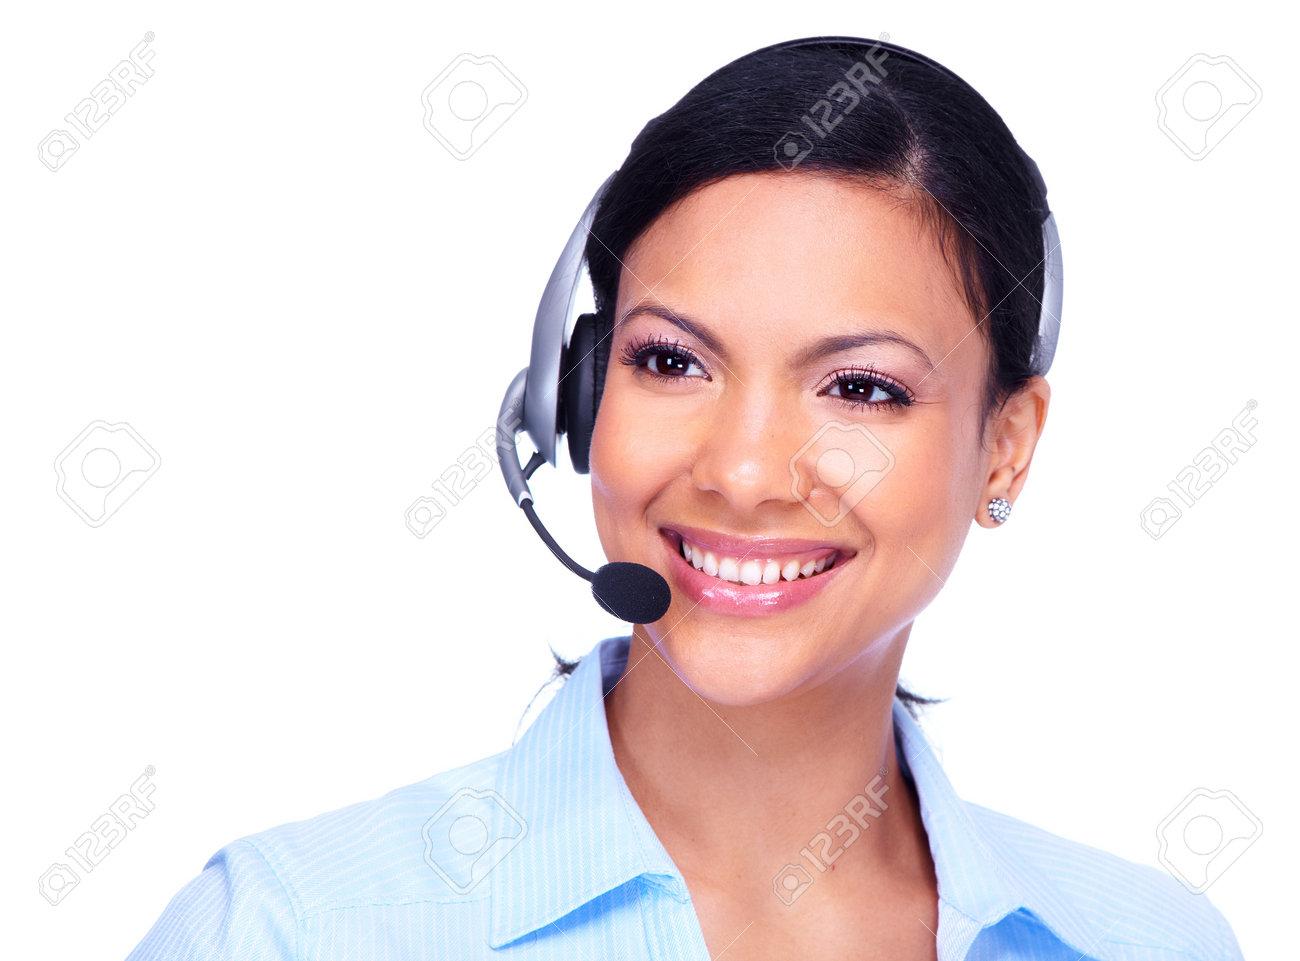 Call center operator business woman Stock Photo - 13388057